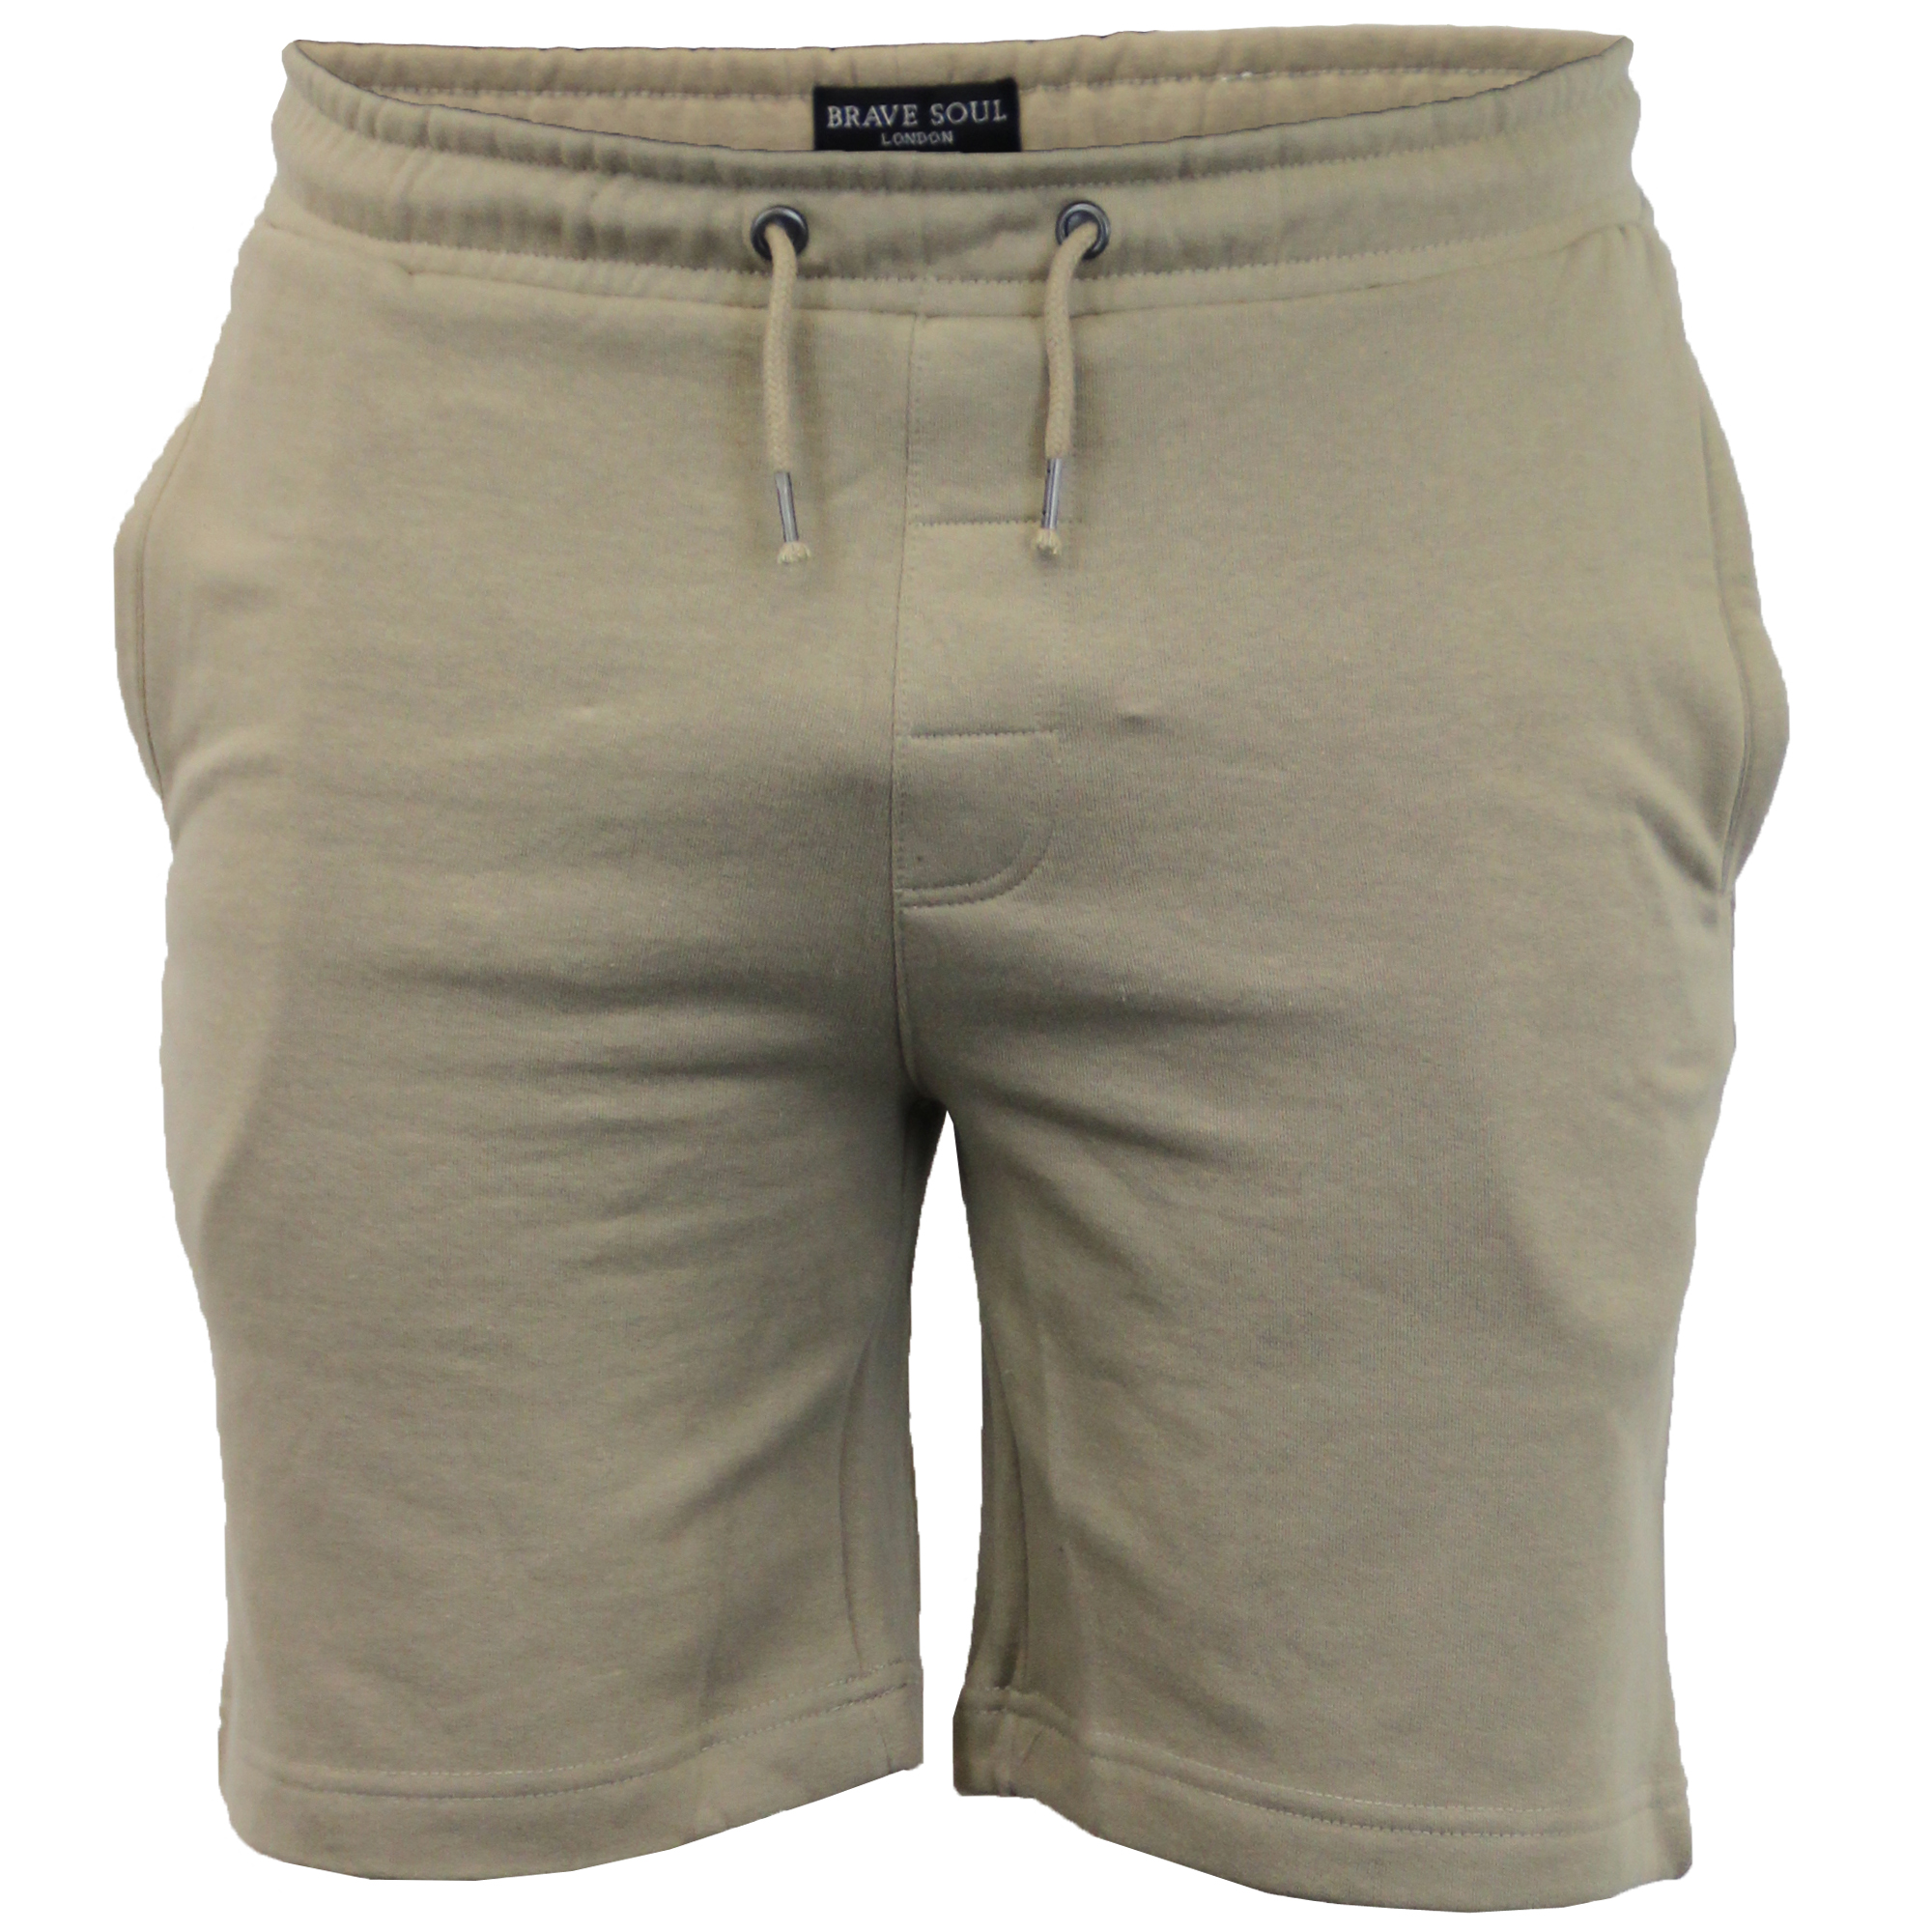 Mens-Jogger-Shorts-Tarley-by-Brave-Soul-Knee-Length-Casual-Fleece-Lined-Summer thumbnail 17